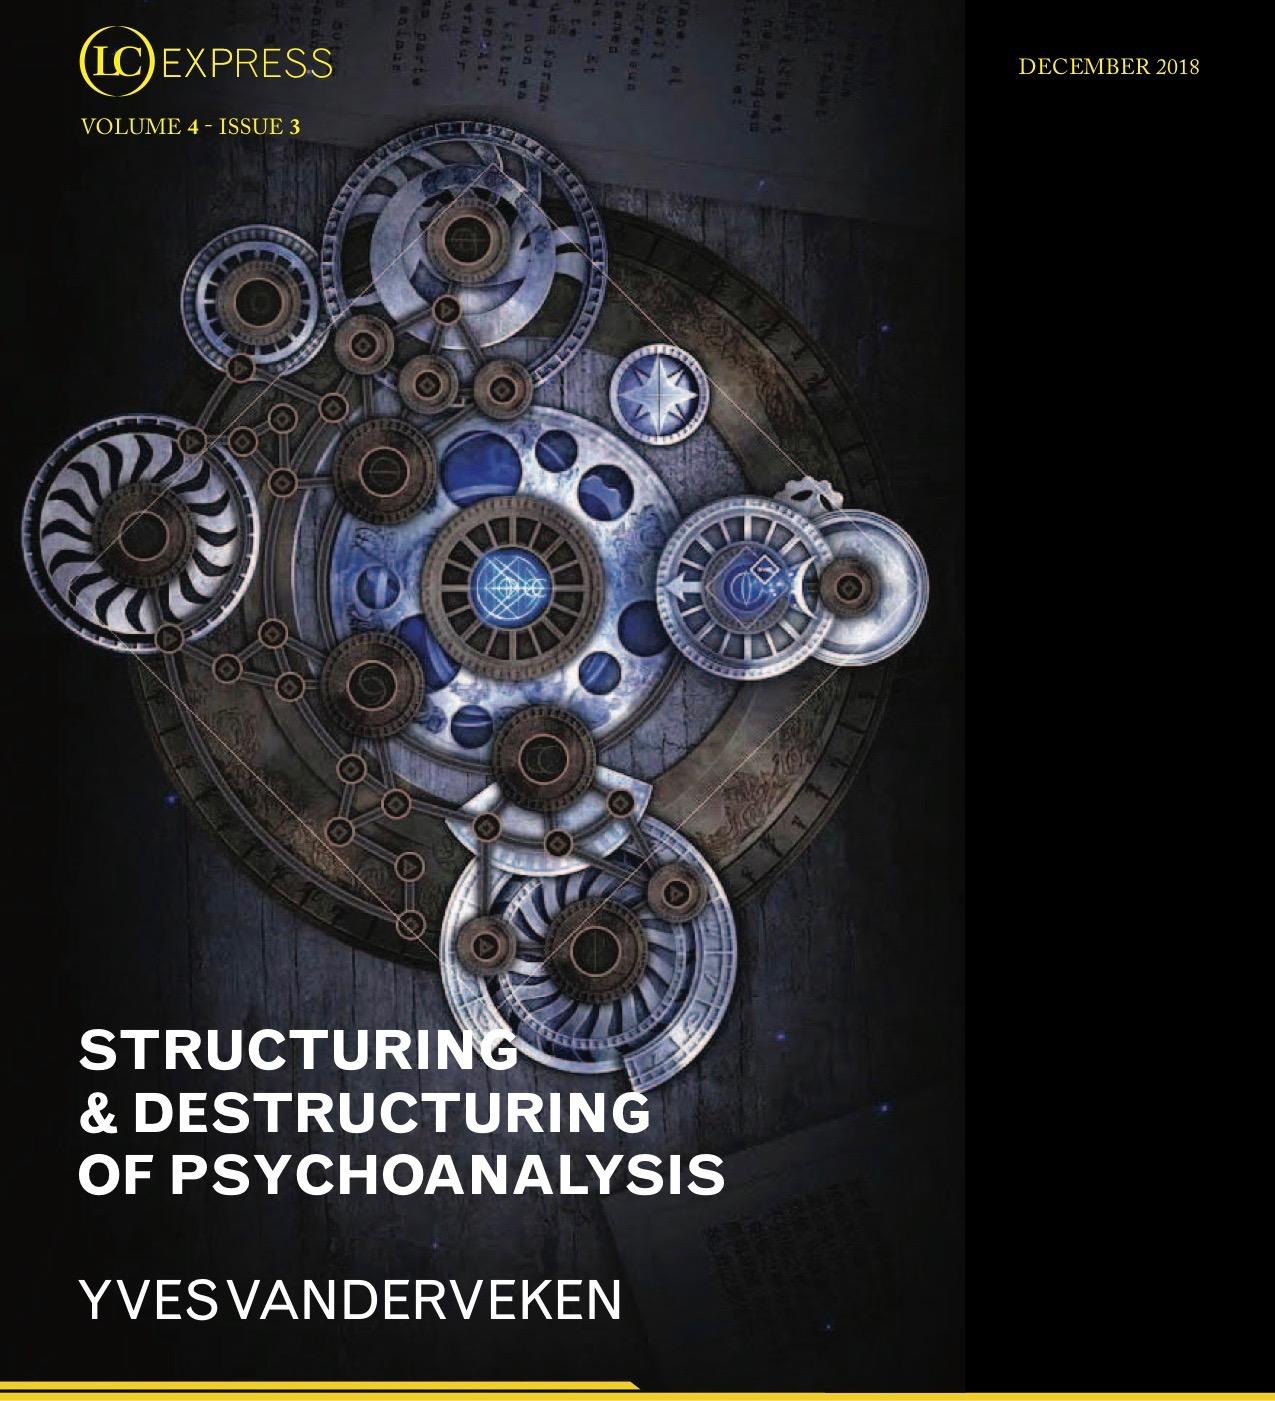 LCExpress Volume 4 / Issue 3  STRUCTURING & DESTRUCTURING OF PSYCHOANALYSIS   Yves Vanderveken